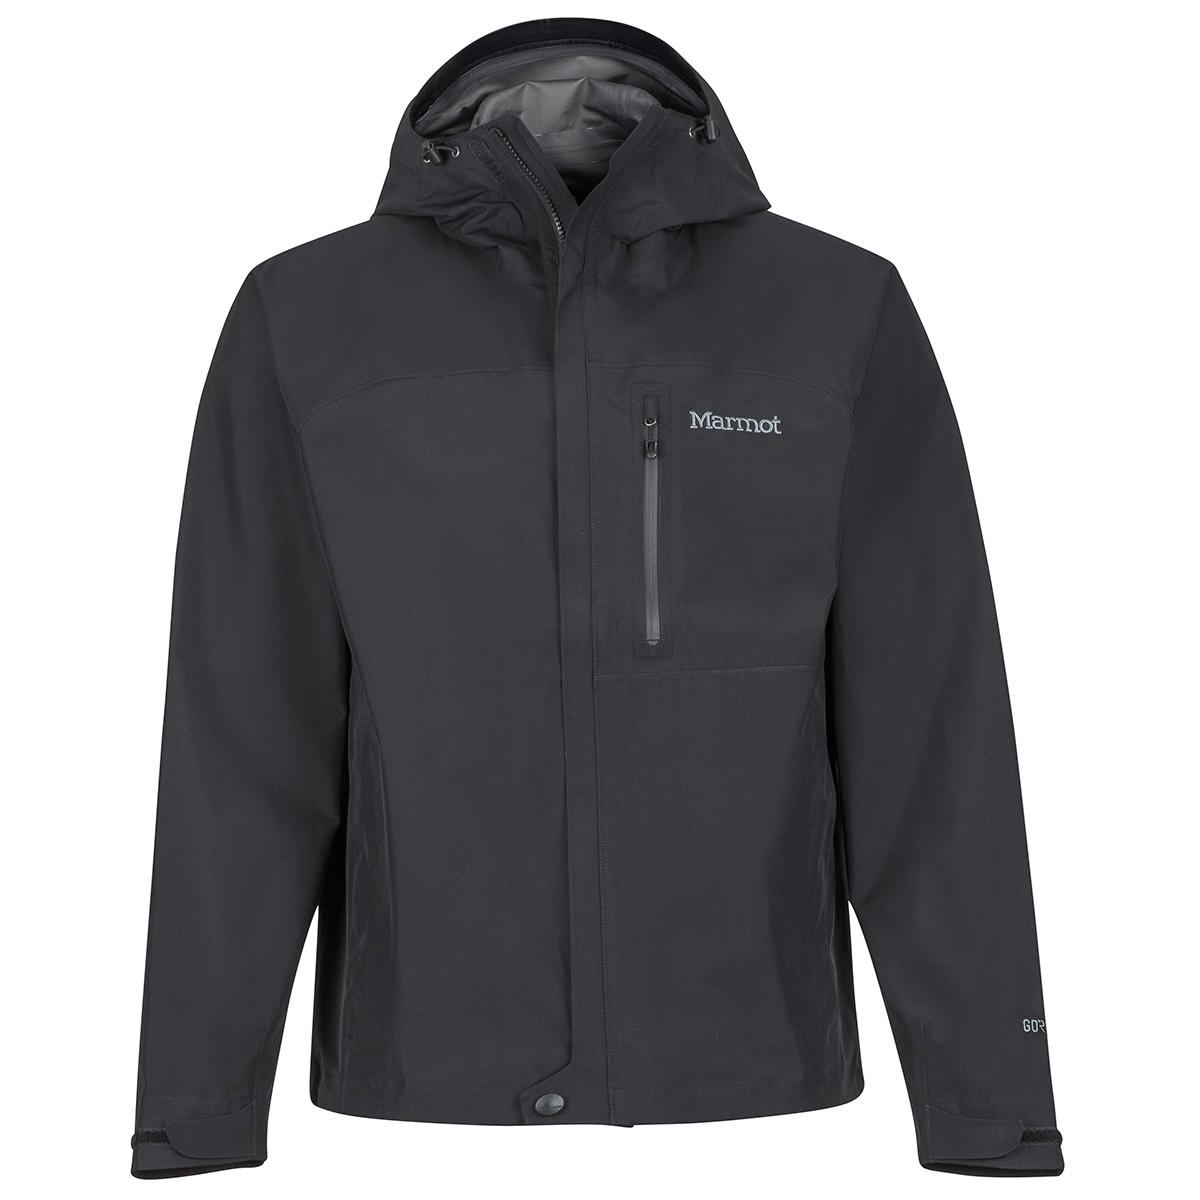 Marmot Men's Minimalist Waterproof Jacket - Black, XL